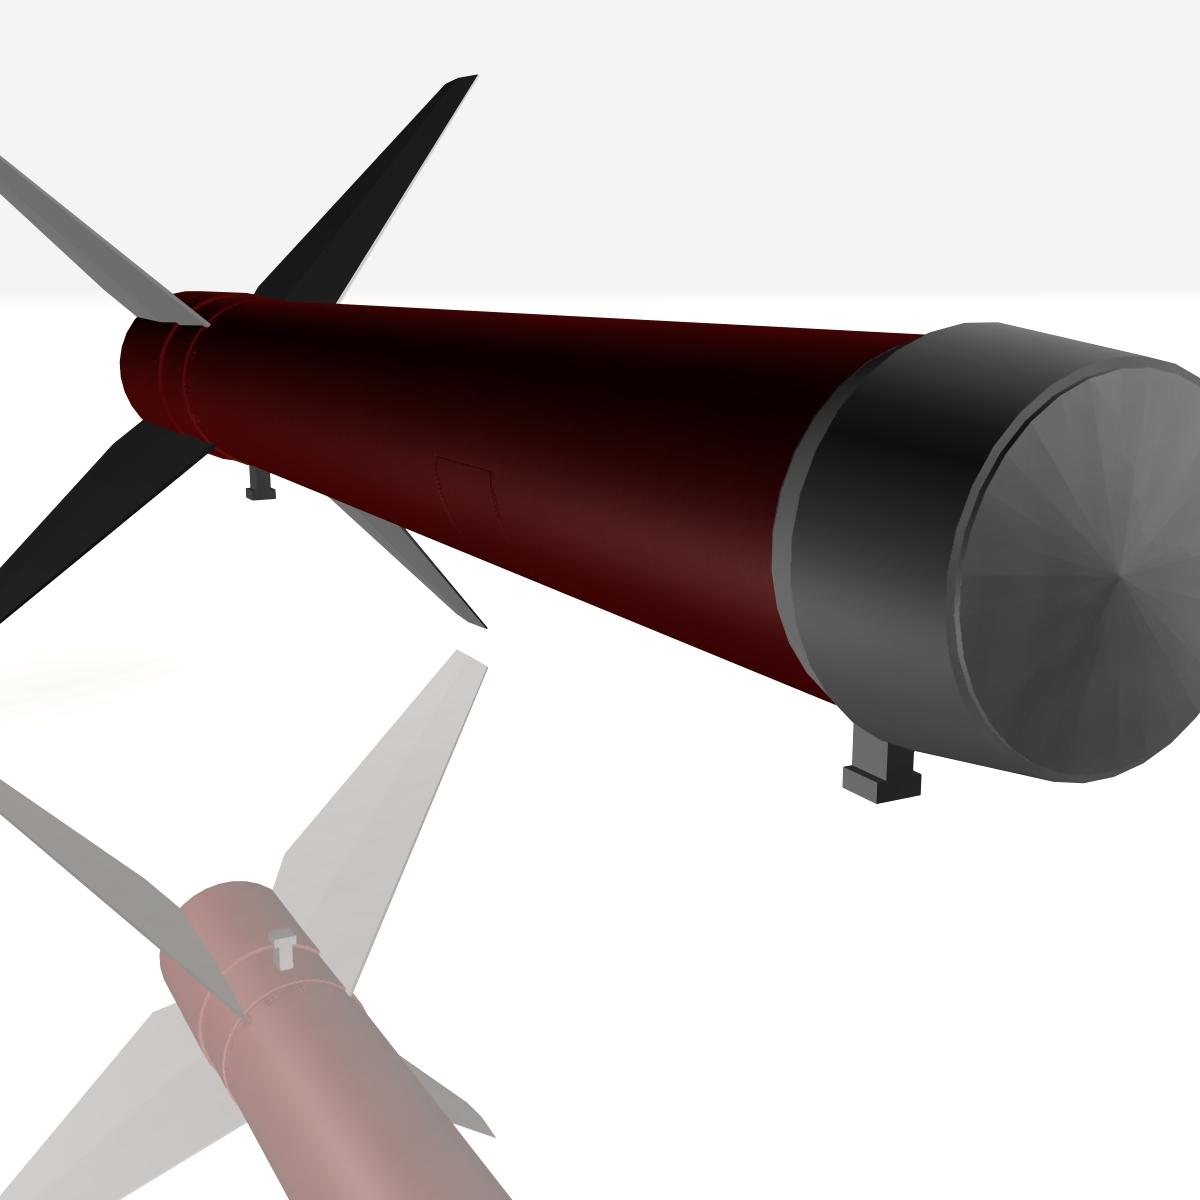 Astrobee 200 Rocket 3d model 3ds dxf fbx blend cob dae X   obj 165950